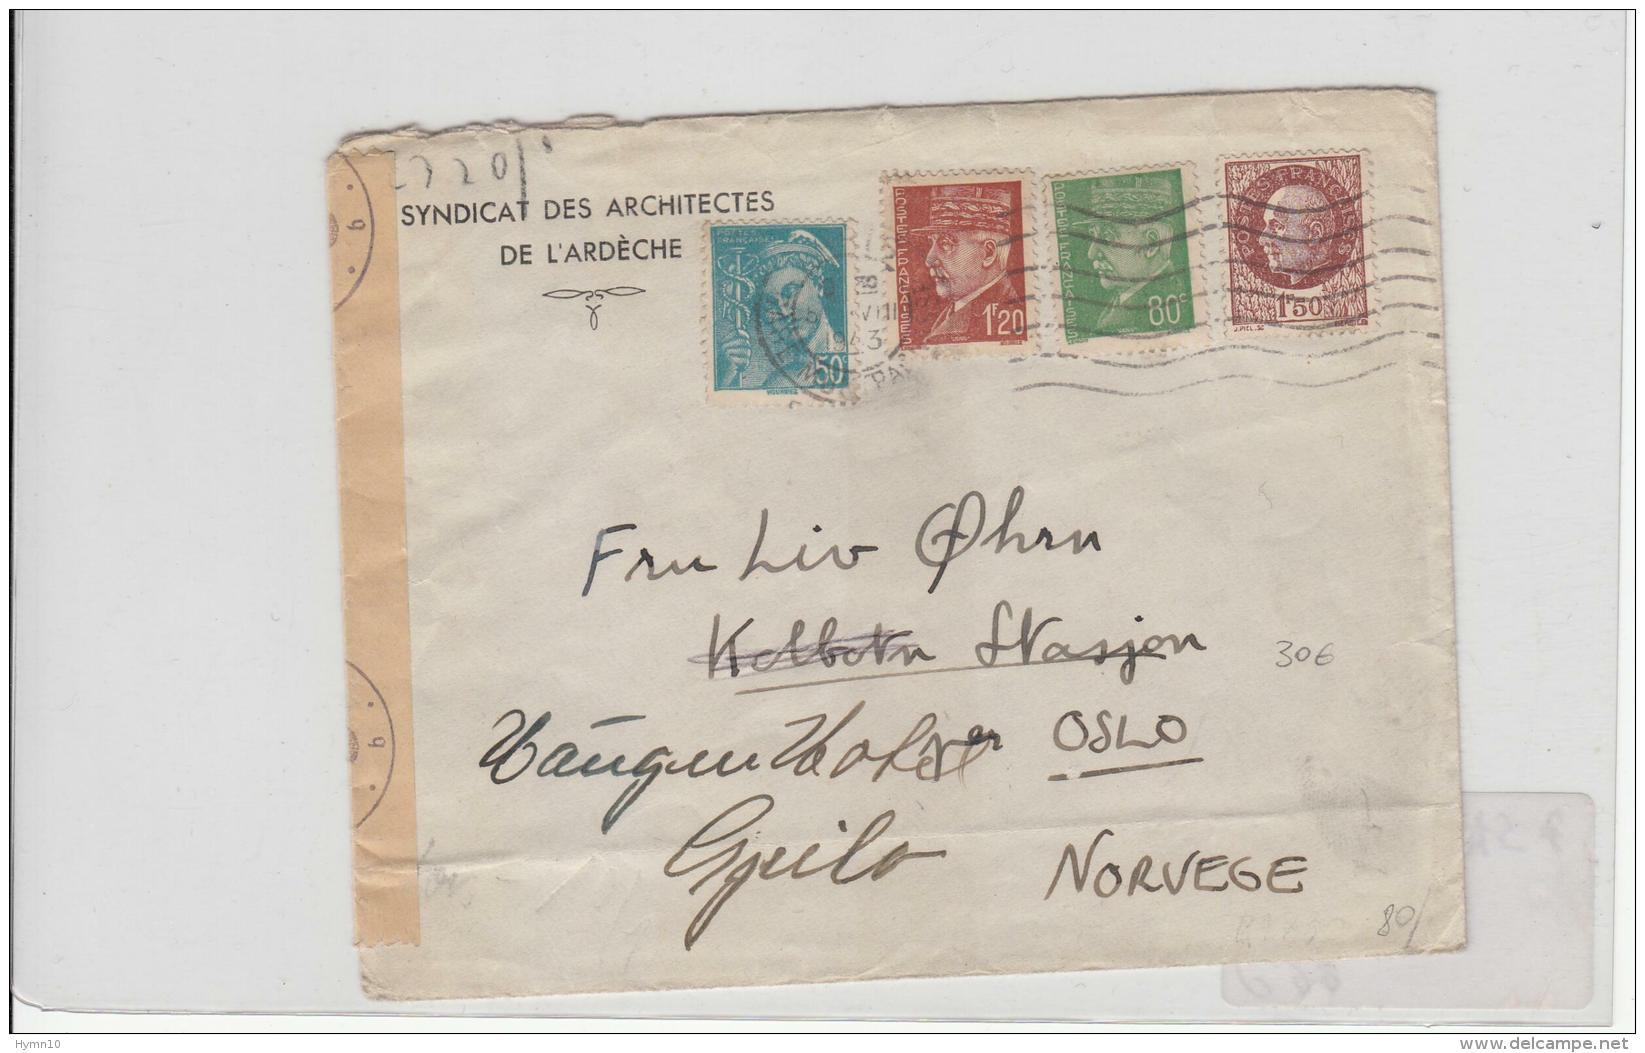 1943 Lettre ARDECHE Syndacat Architectes A Norvège-F.1,20+0,80 Petain+F.1,50+0,50+Censure -f922 - Poststempel (Briefe)